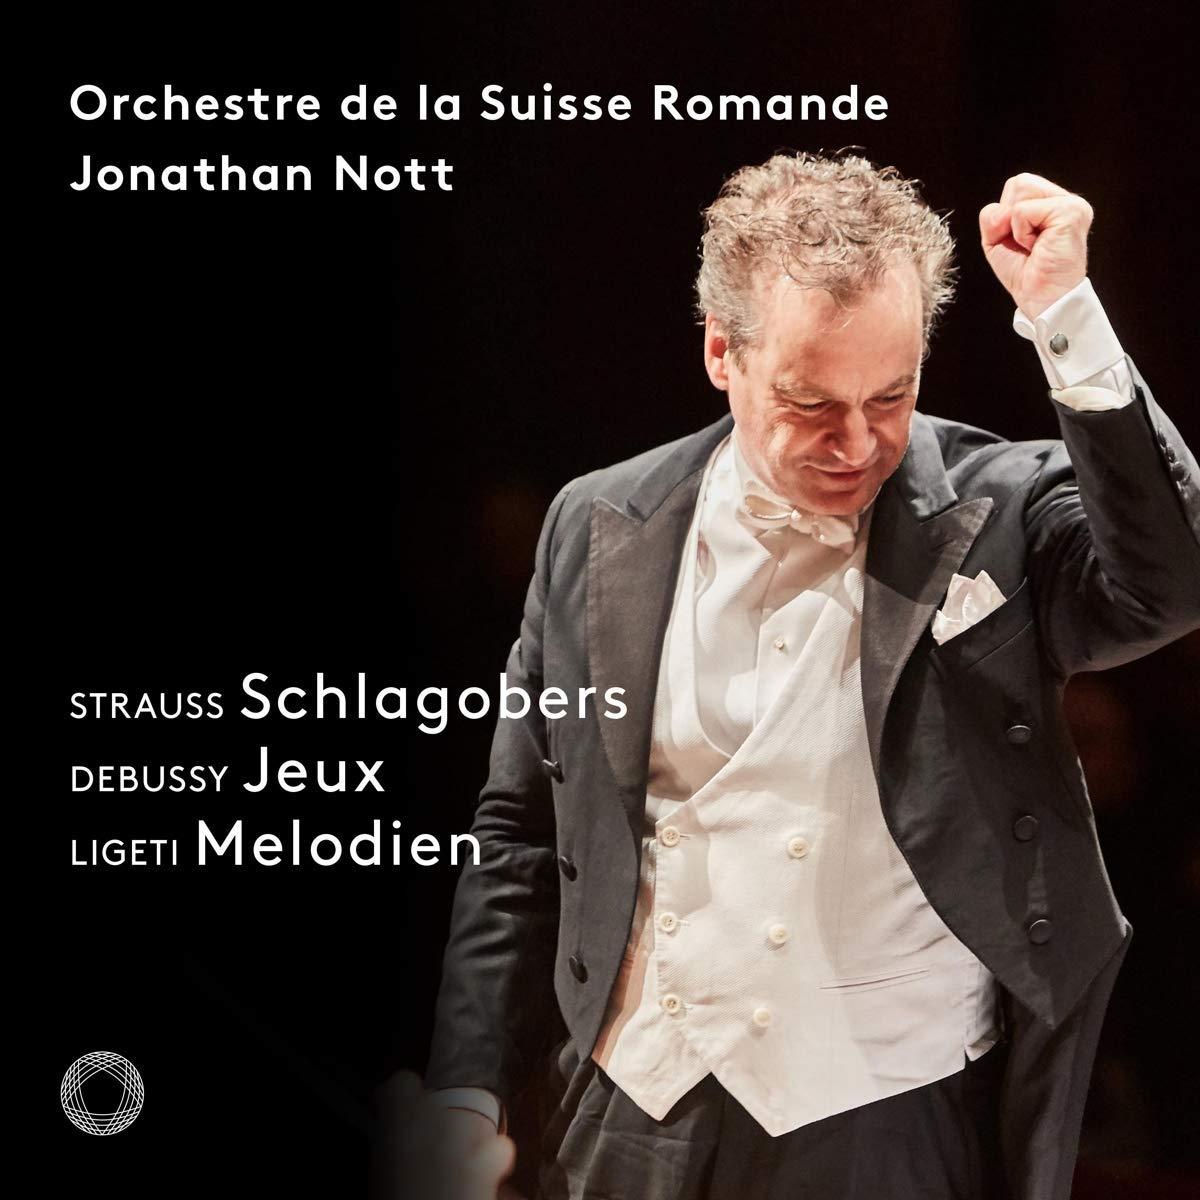 Audio Cd Strauss/Debussy/Ligeti: Schlagobers / Jeux / Melodien | eBay